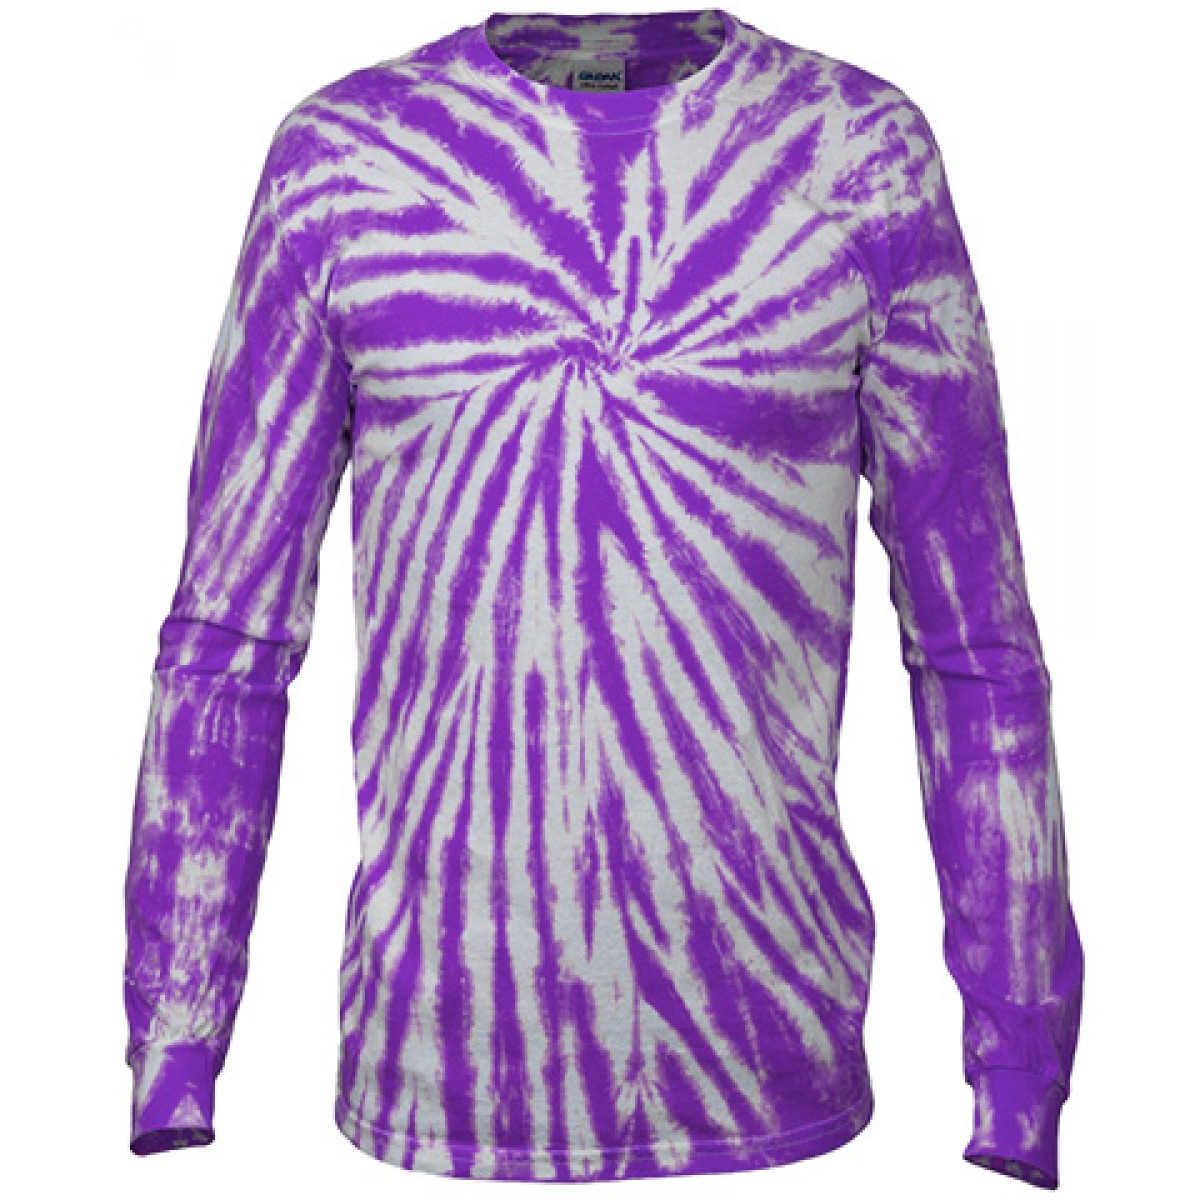 Multi Color Tie-Dye Long Sleeve Shirt -Fuscia-S